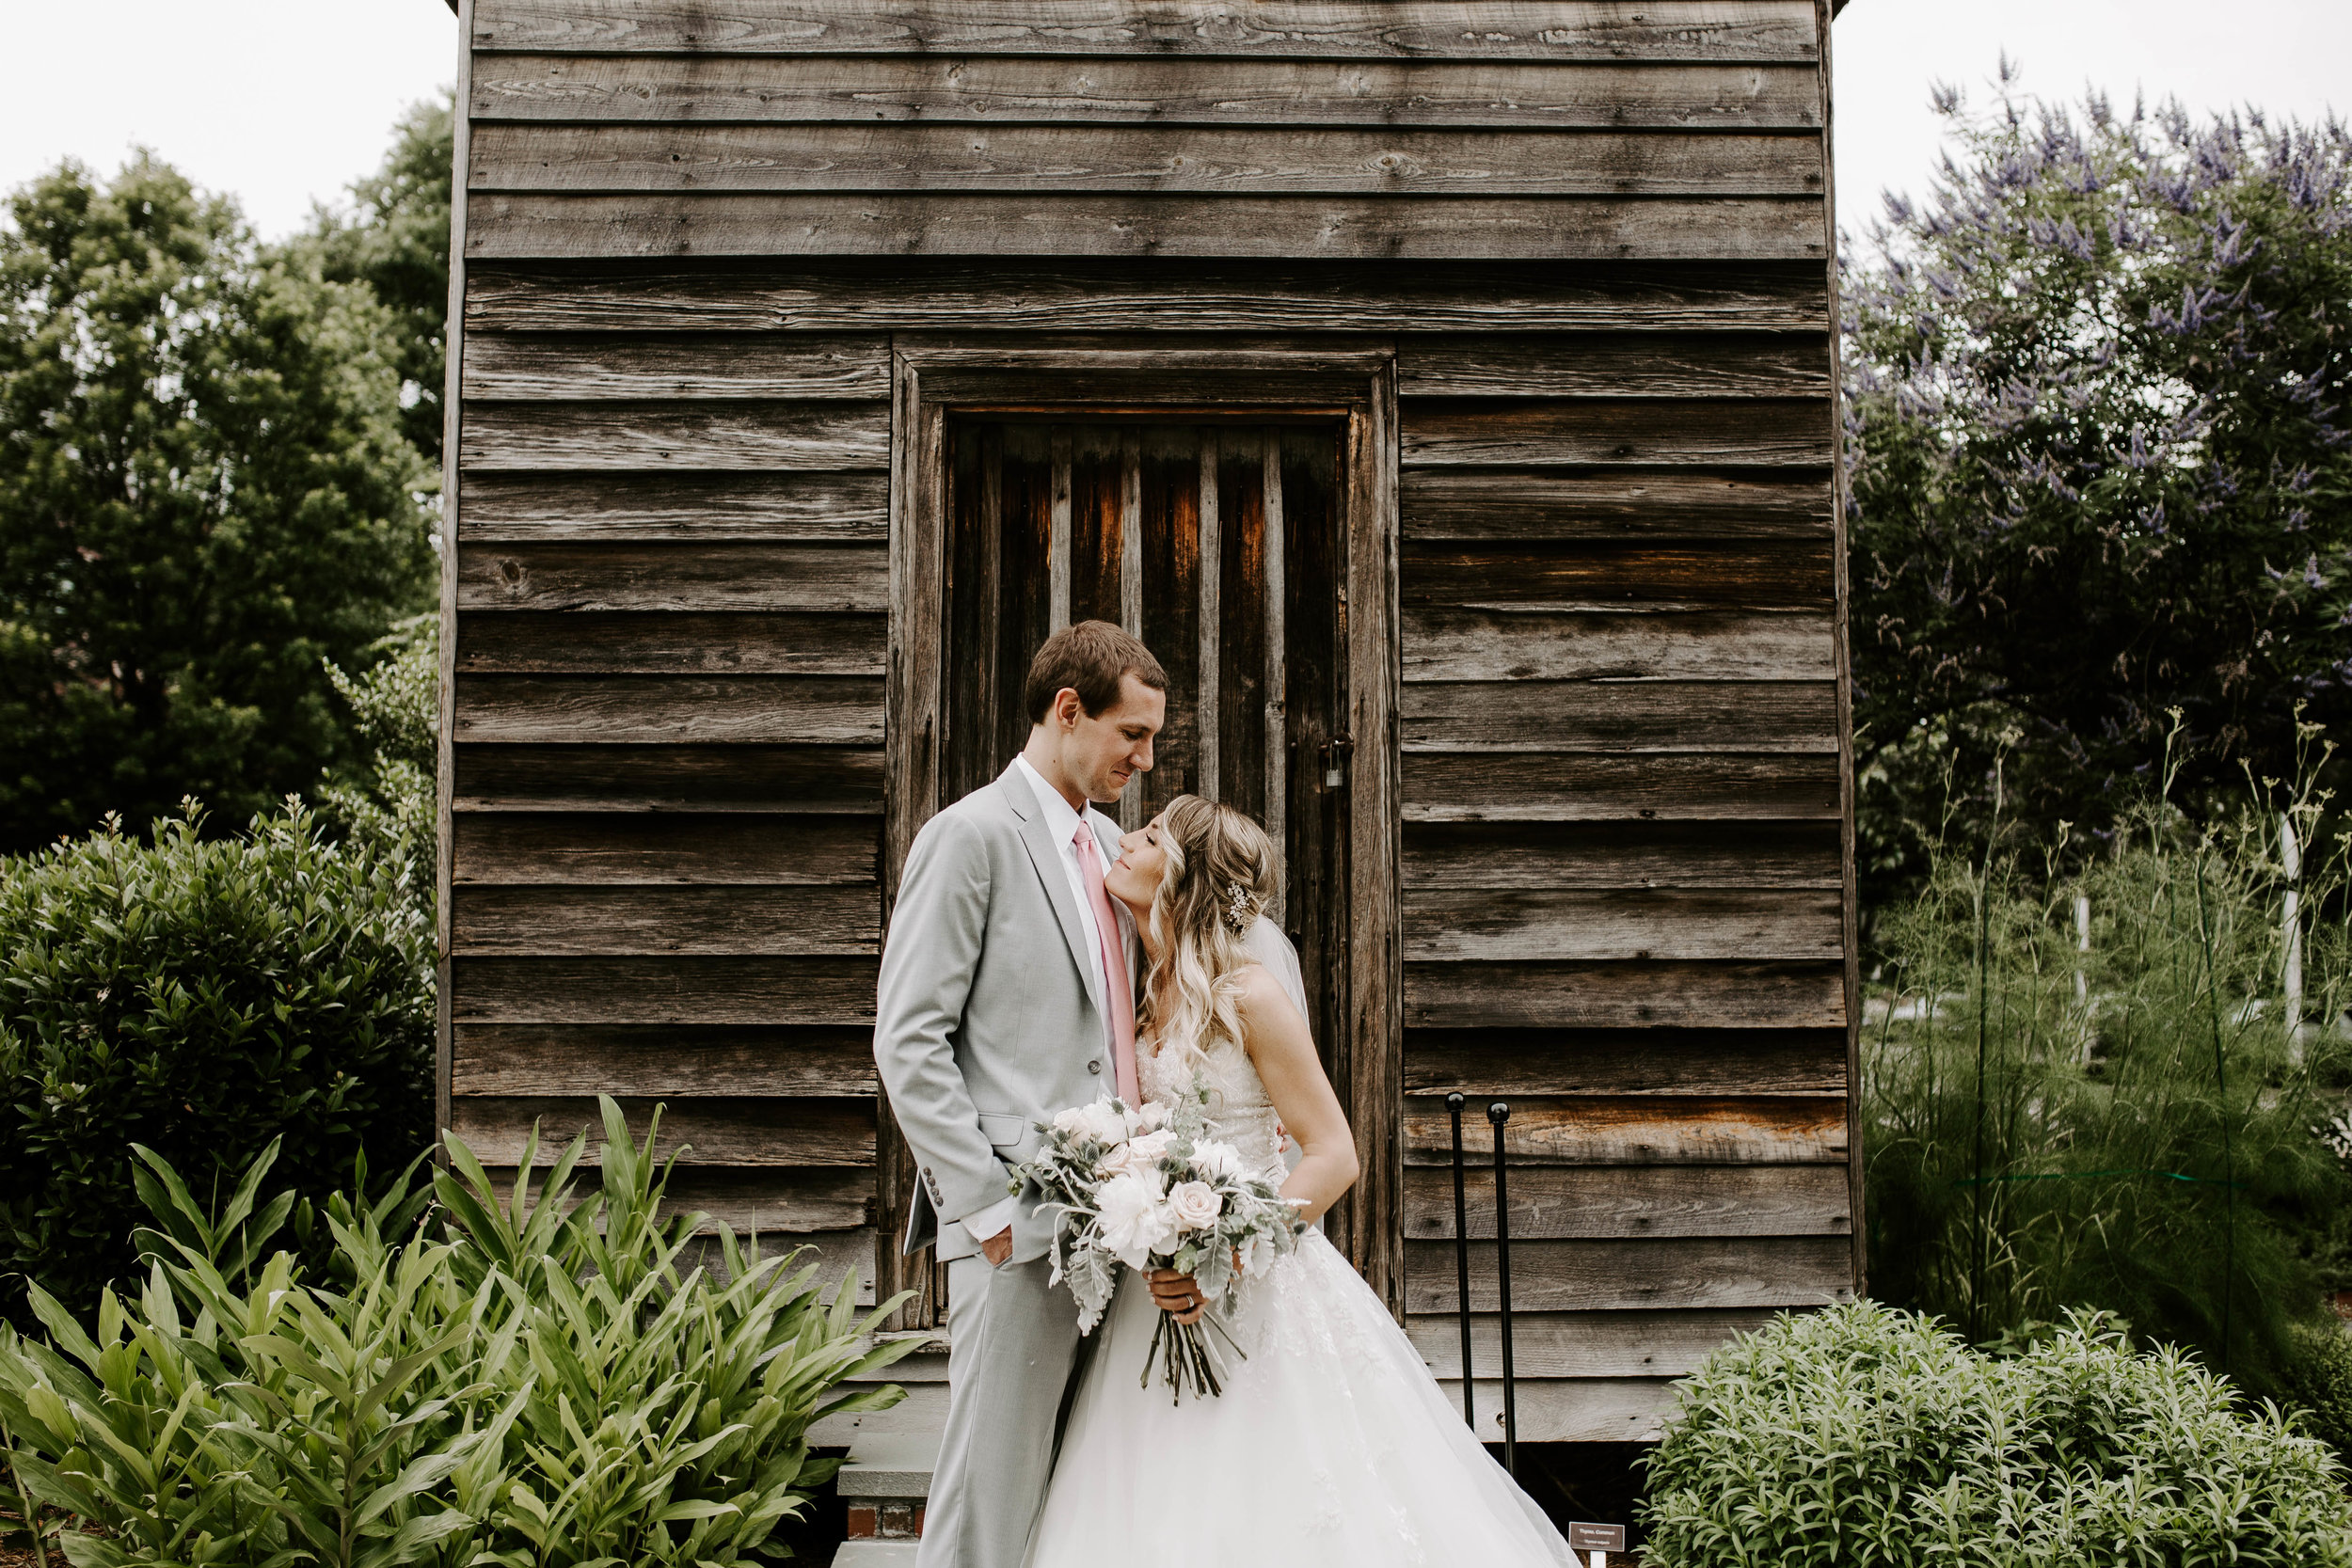 Hartrick Wedding - Downown cary wedding